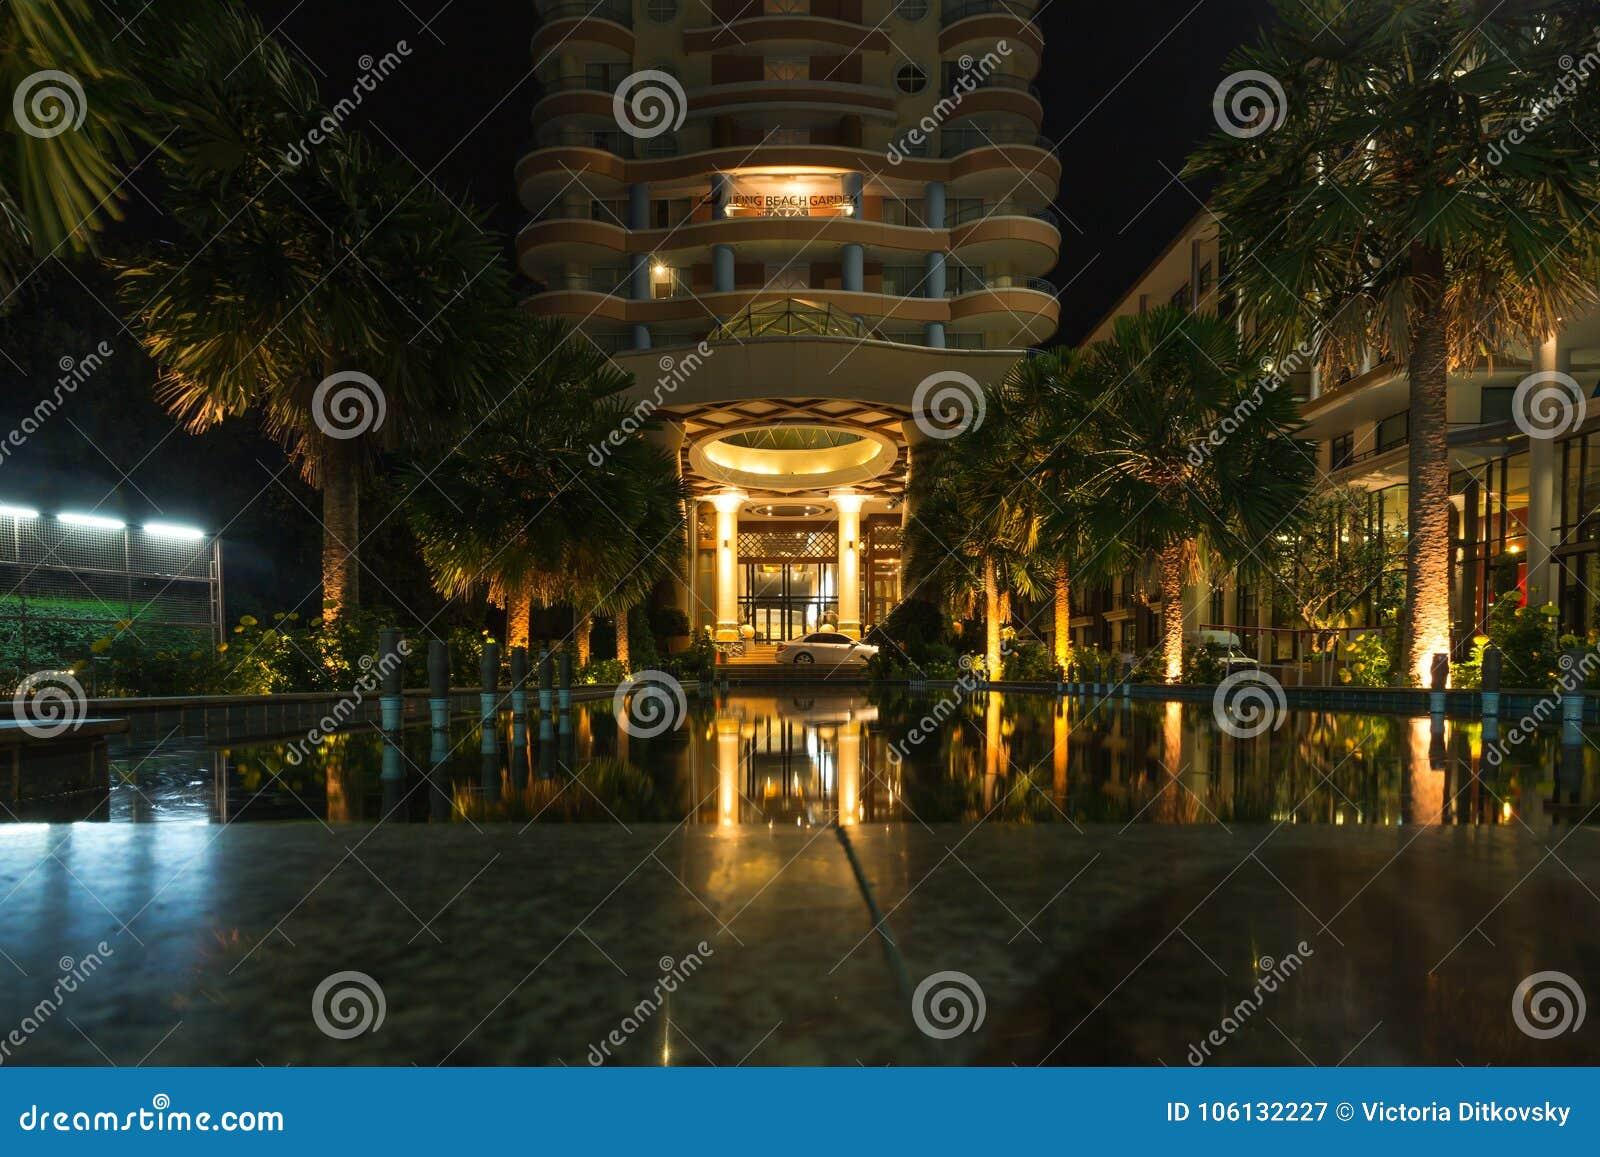 Main Entrance Of Long Beach Garden Hotel And Spa At Nigh Editorial ...